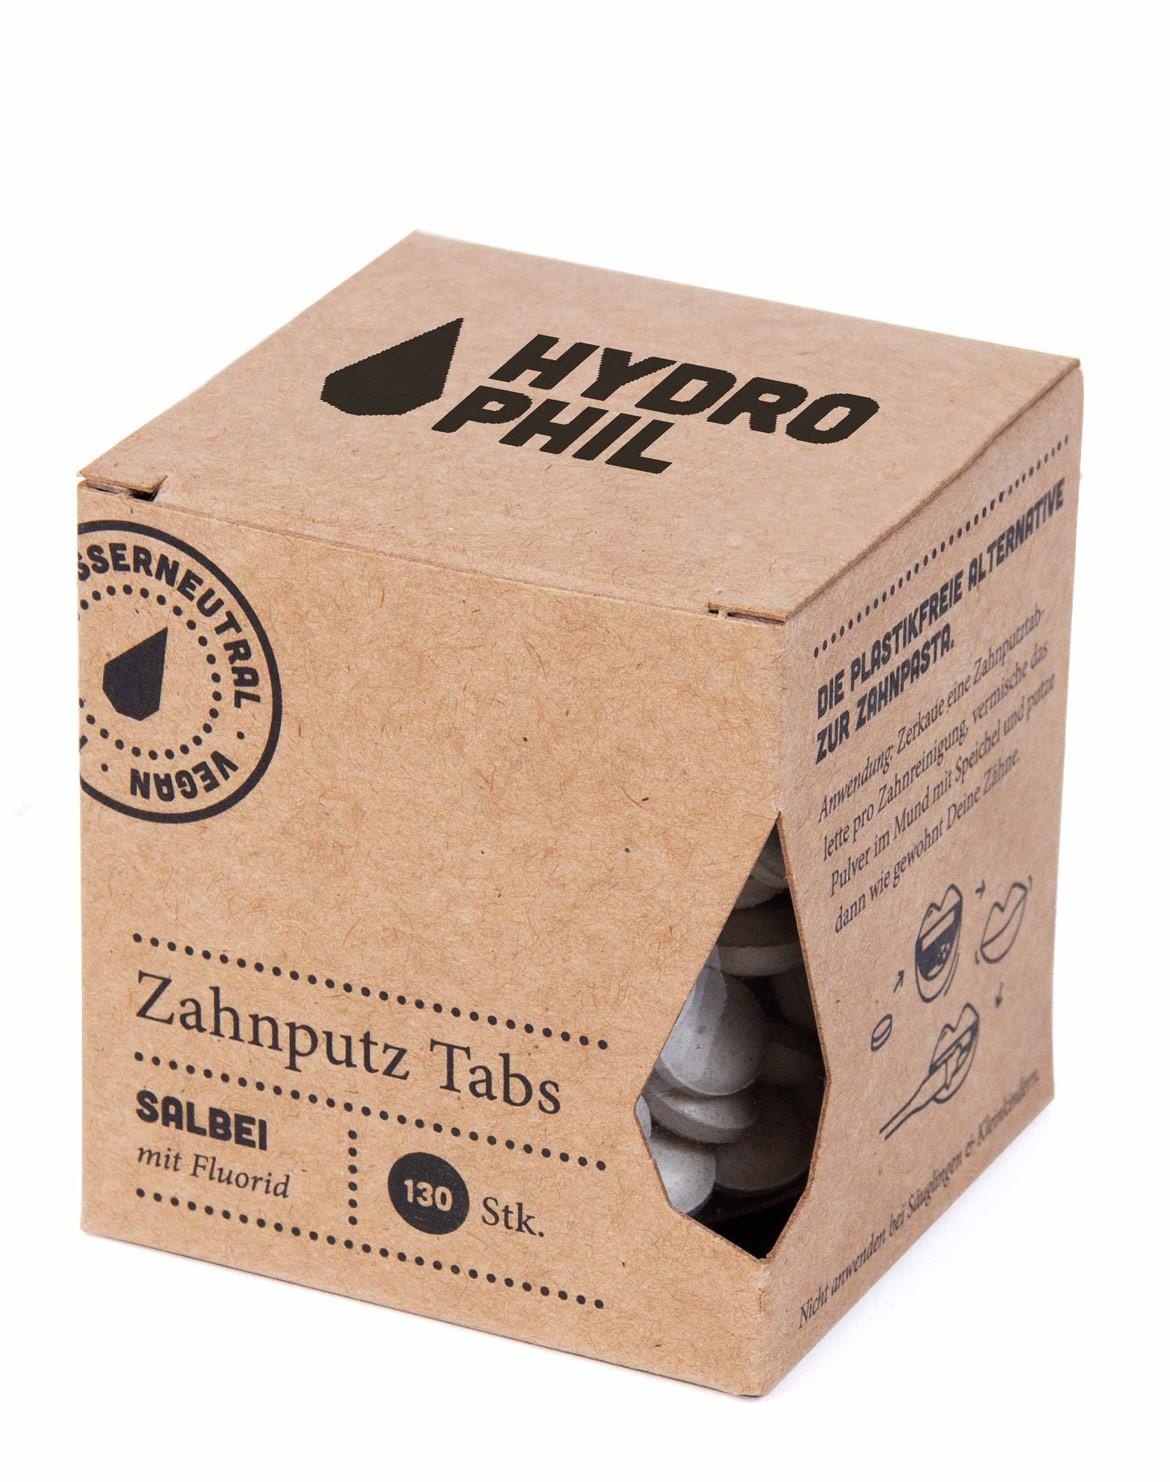 Salbei Zahnputz Tabs